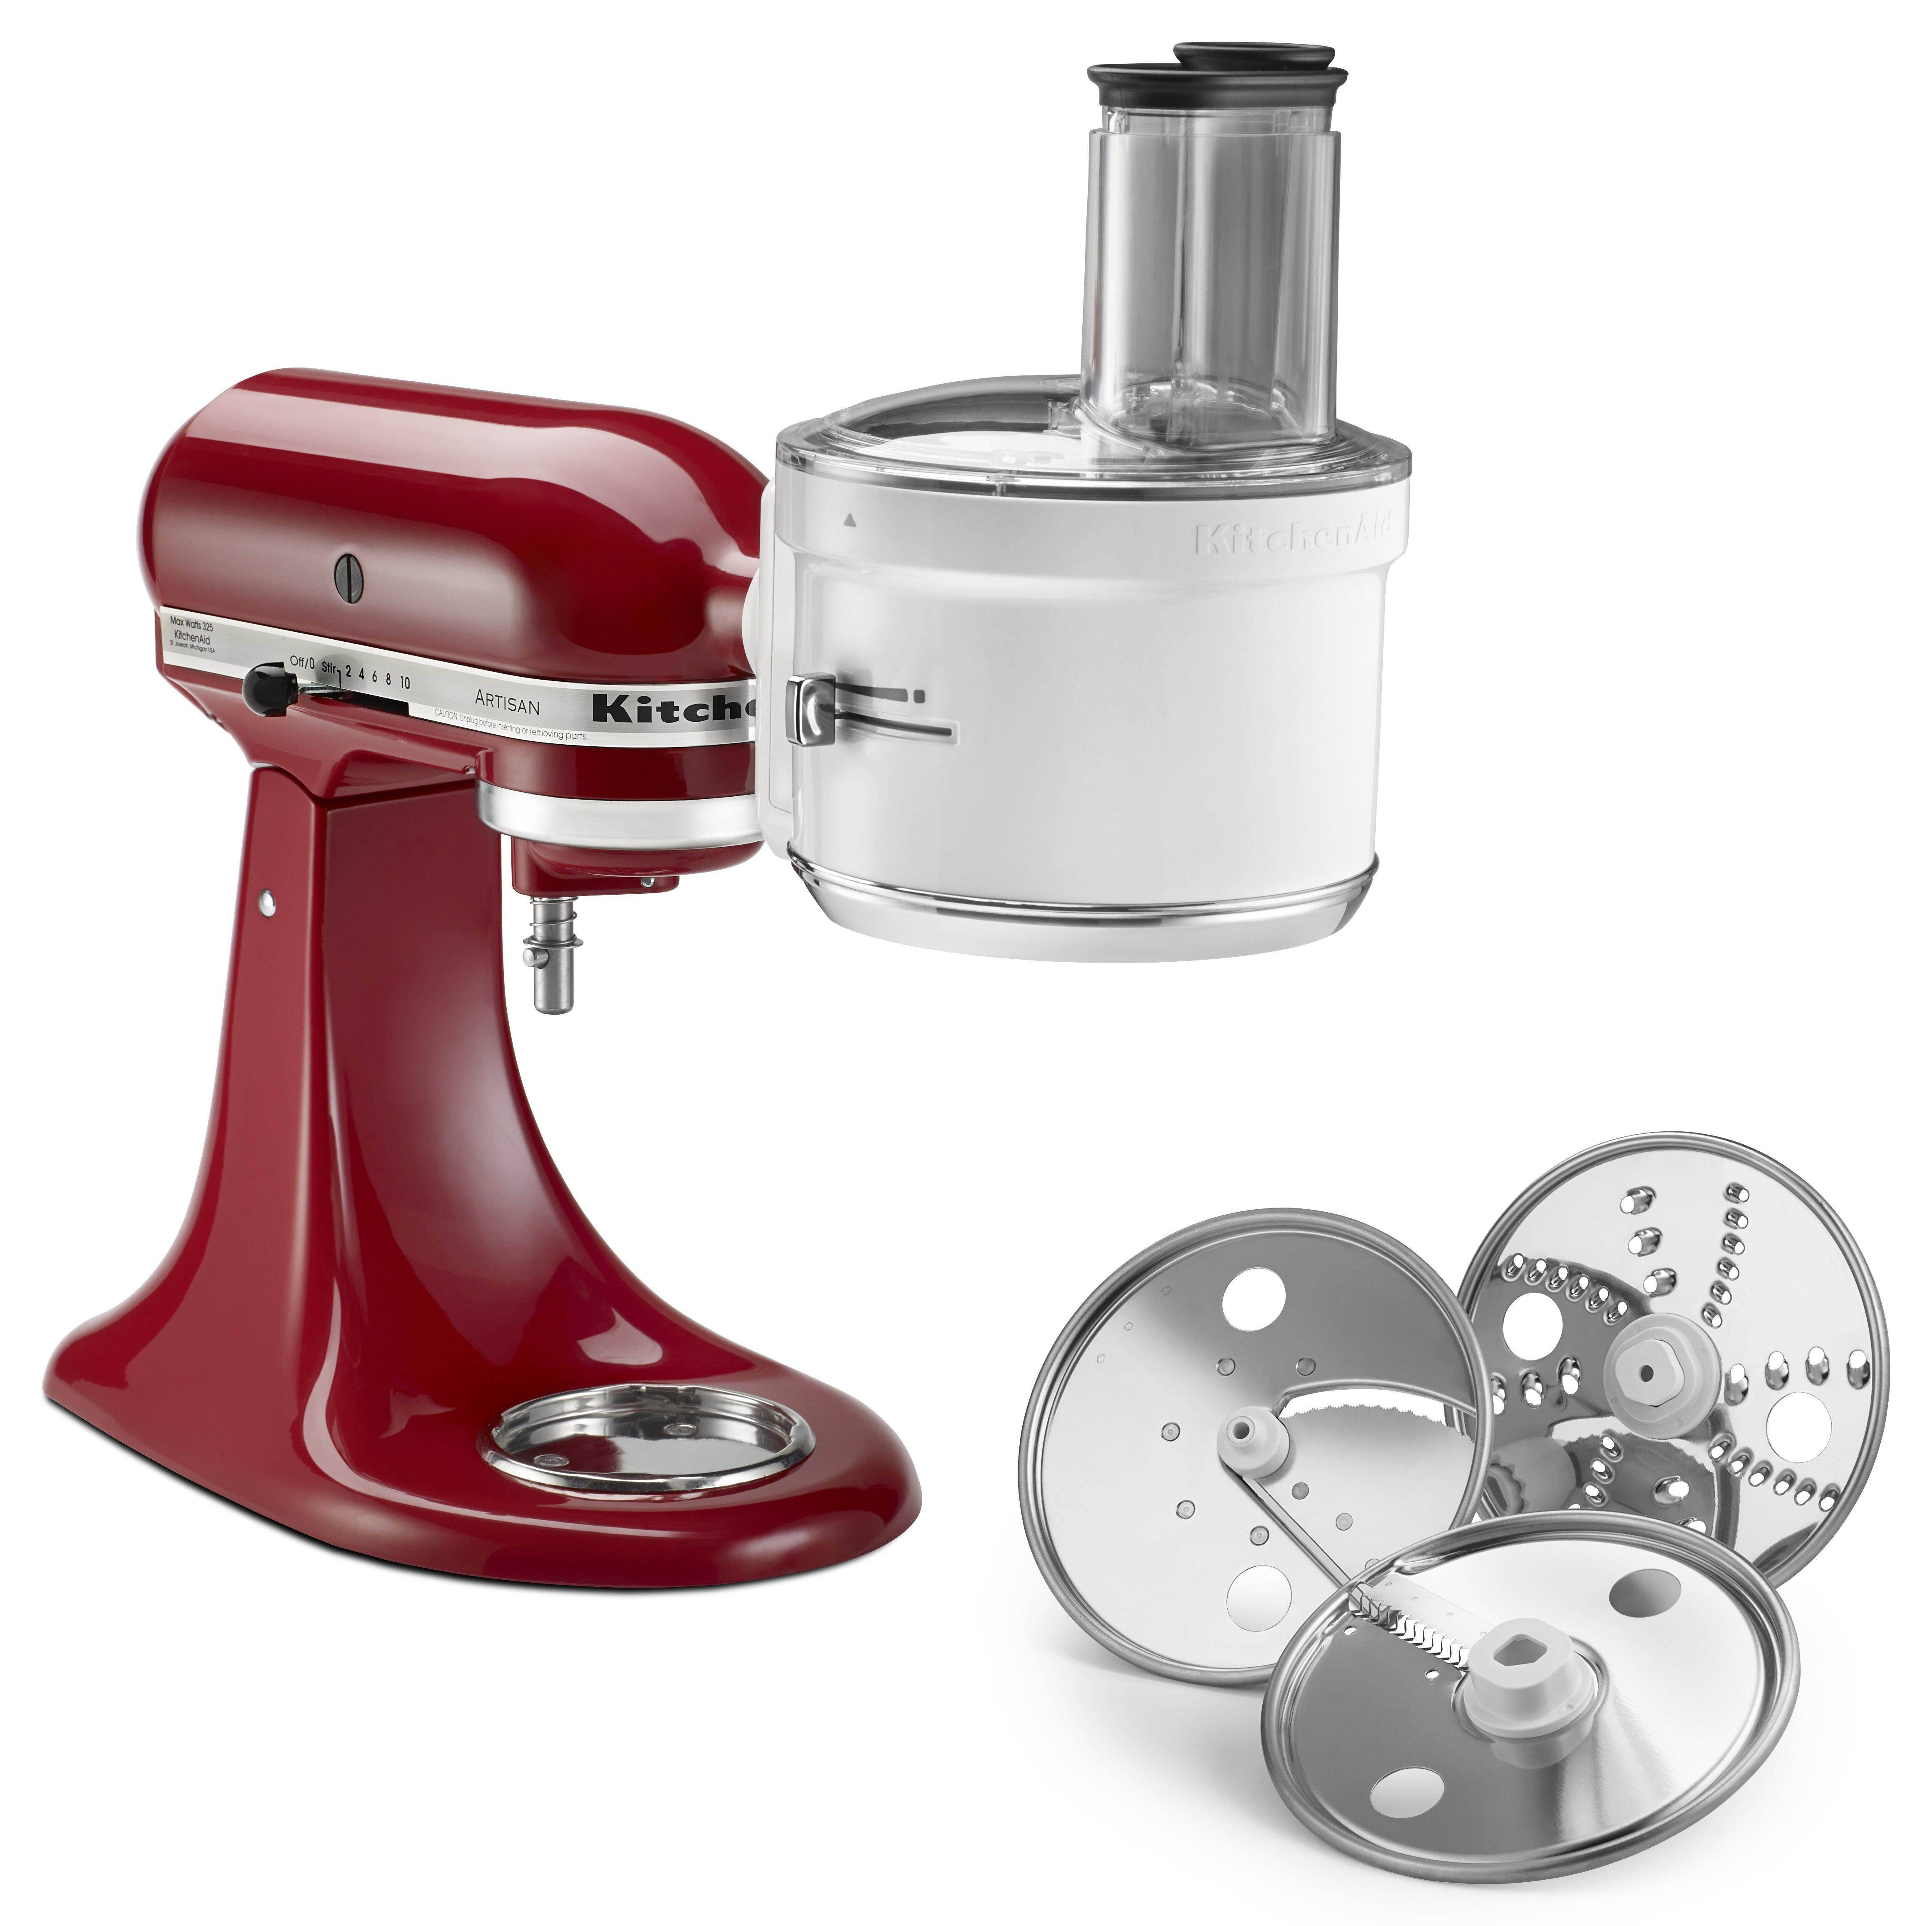 KitchenAid Food Processor Blender Accessory | Wayfair on hobart slicer shredder, kitchenaid mixer slicer attachment, kitchenaid mixer shredder,